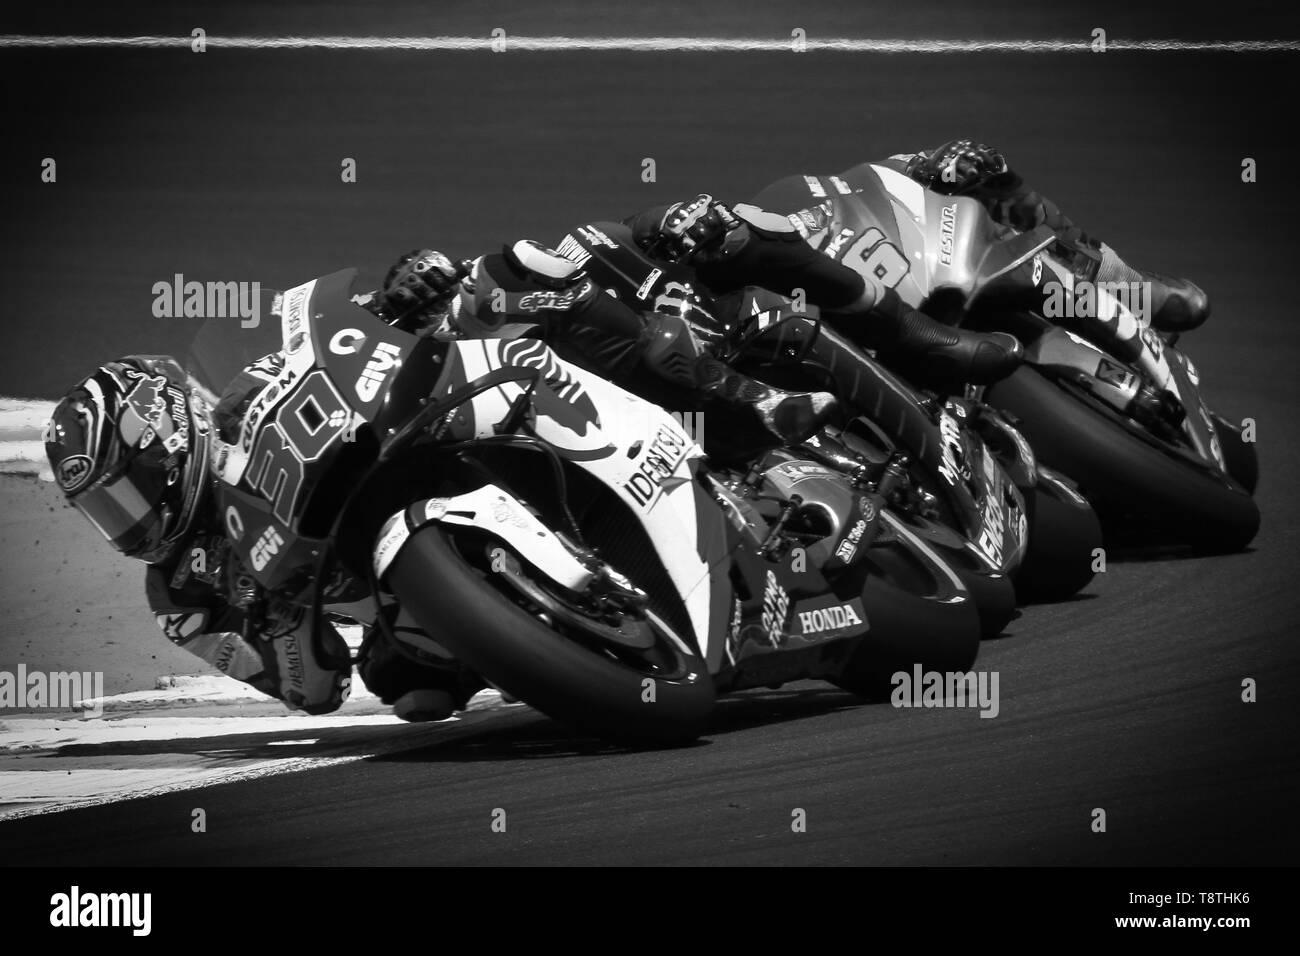 Sunday race, MotoGP Spain round Stock Photo